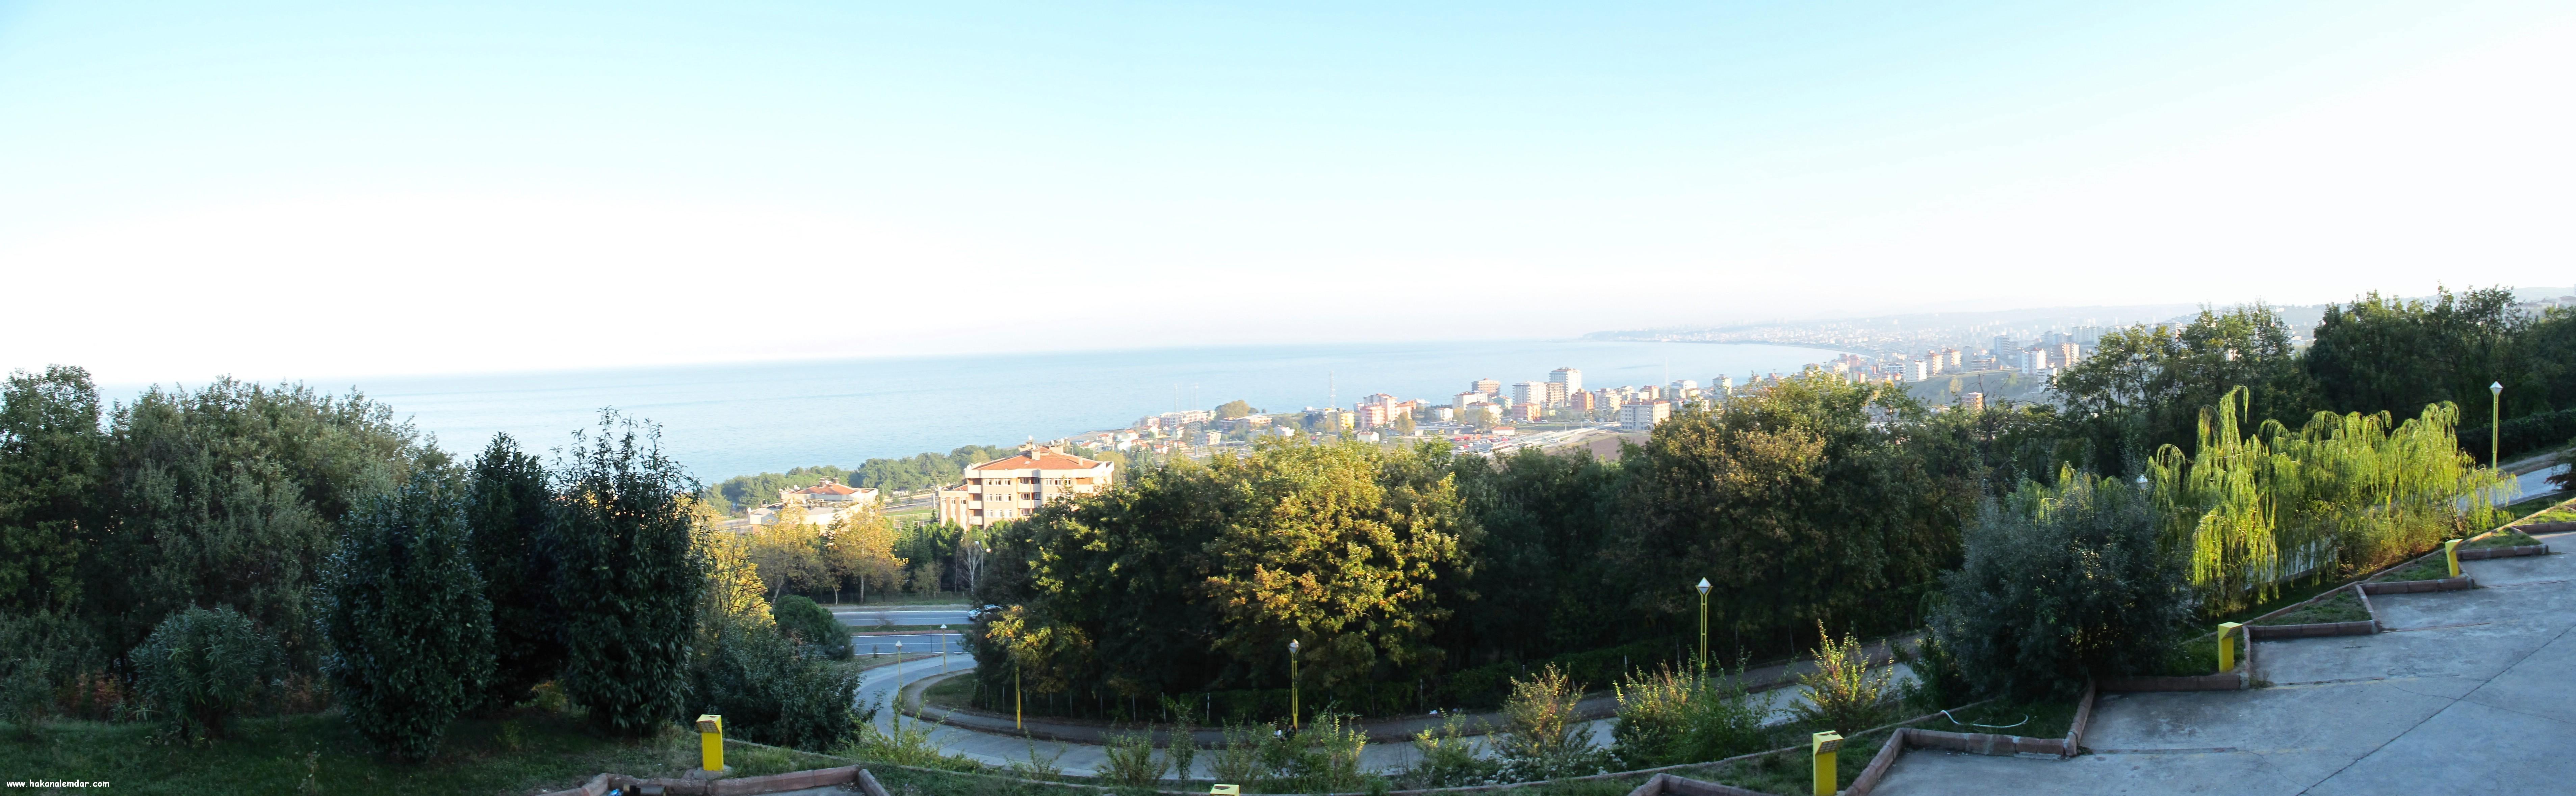 Panorama SAMSUN 02